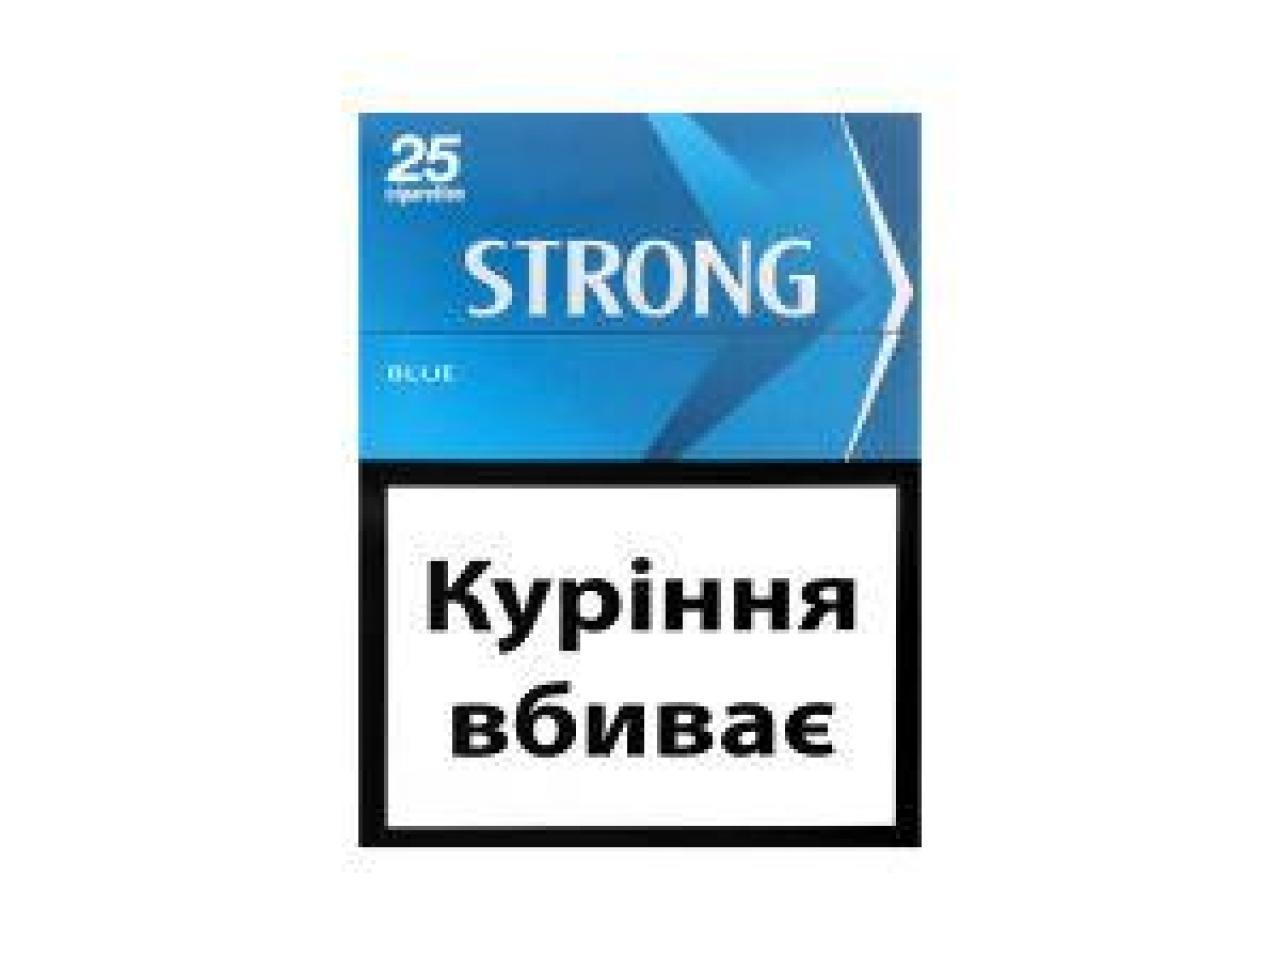 Сигареты Strong - 3